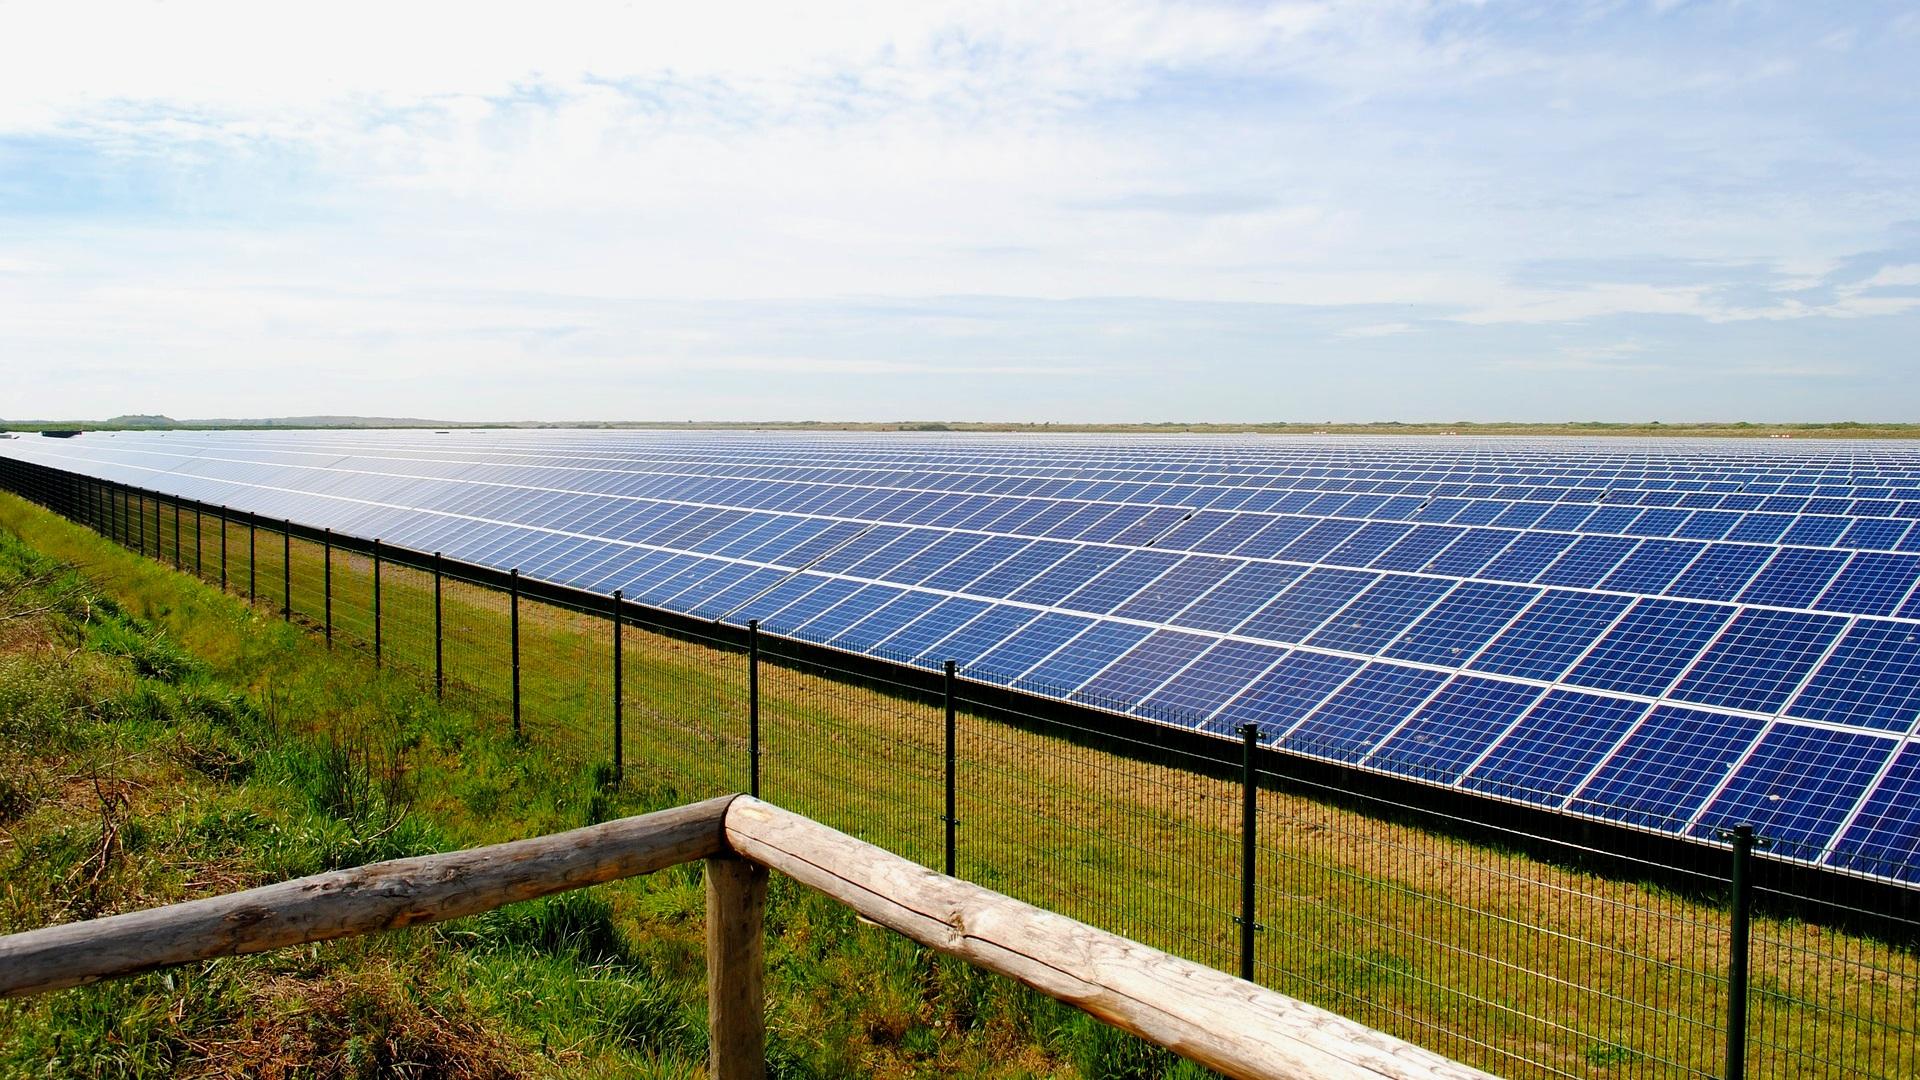 solar-panels-2423614_1920.jpg